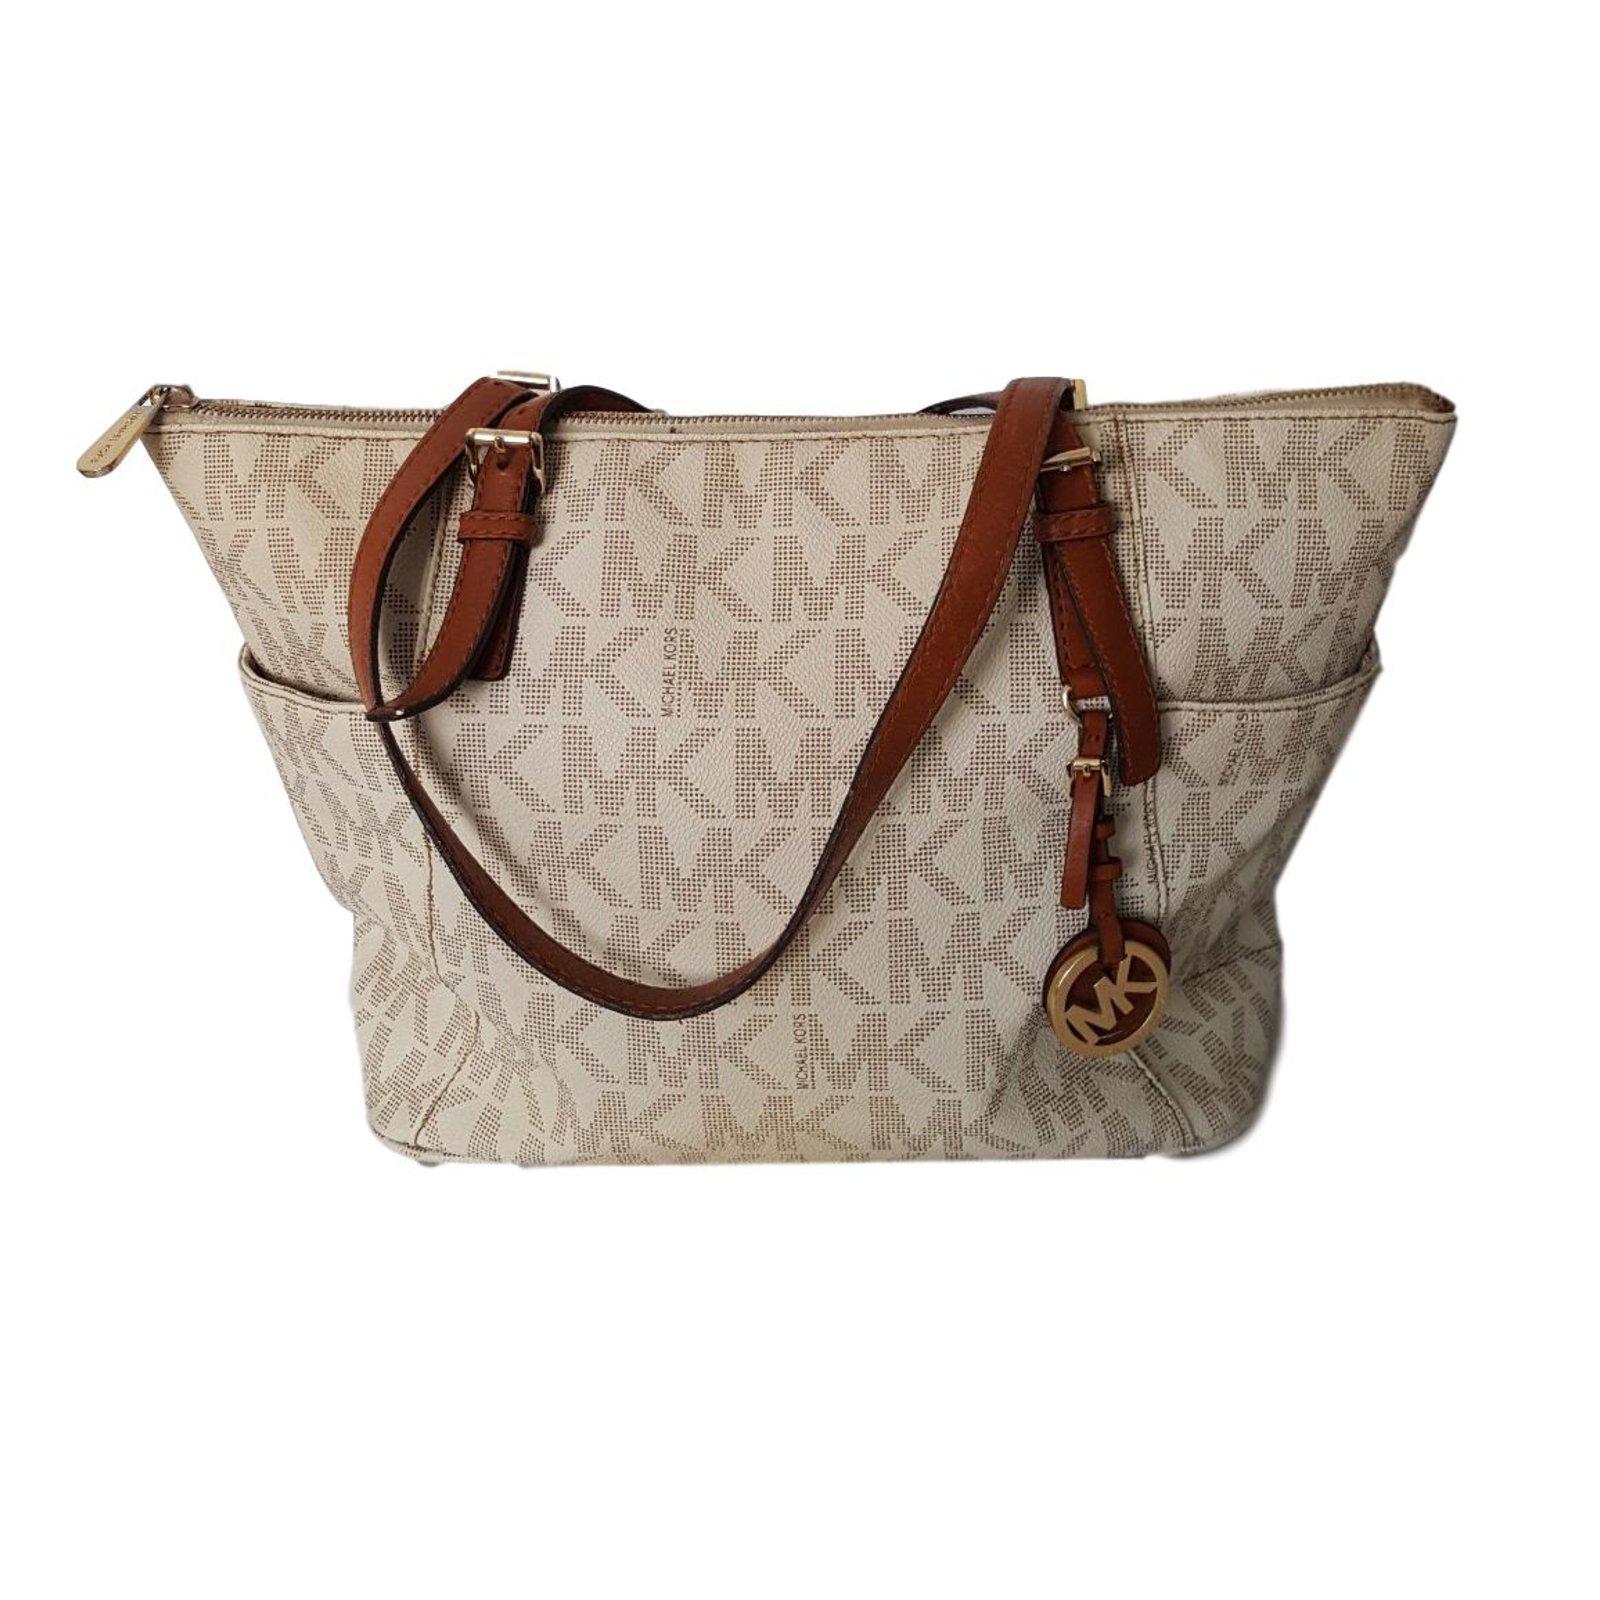 Michael Kors Cloth HandbagsHandbag Reviews 2020